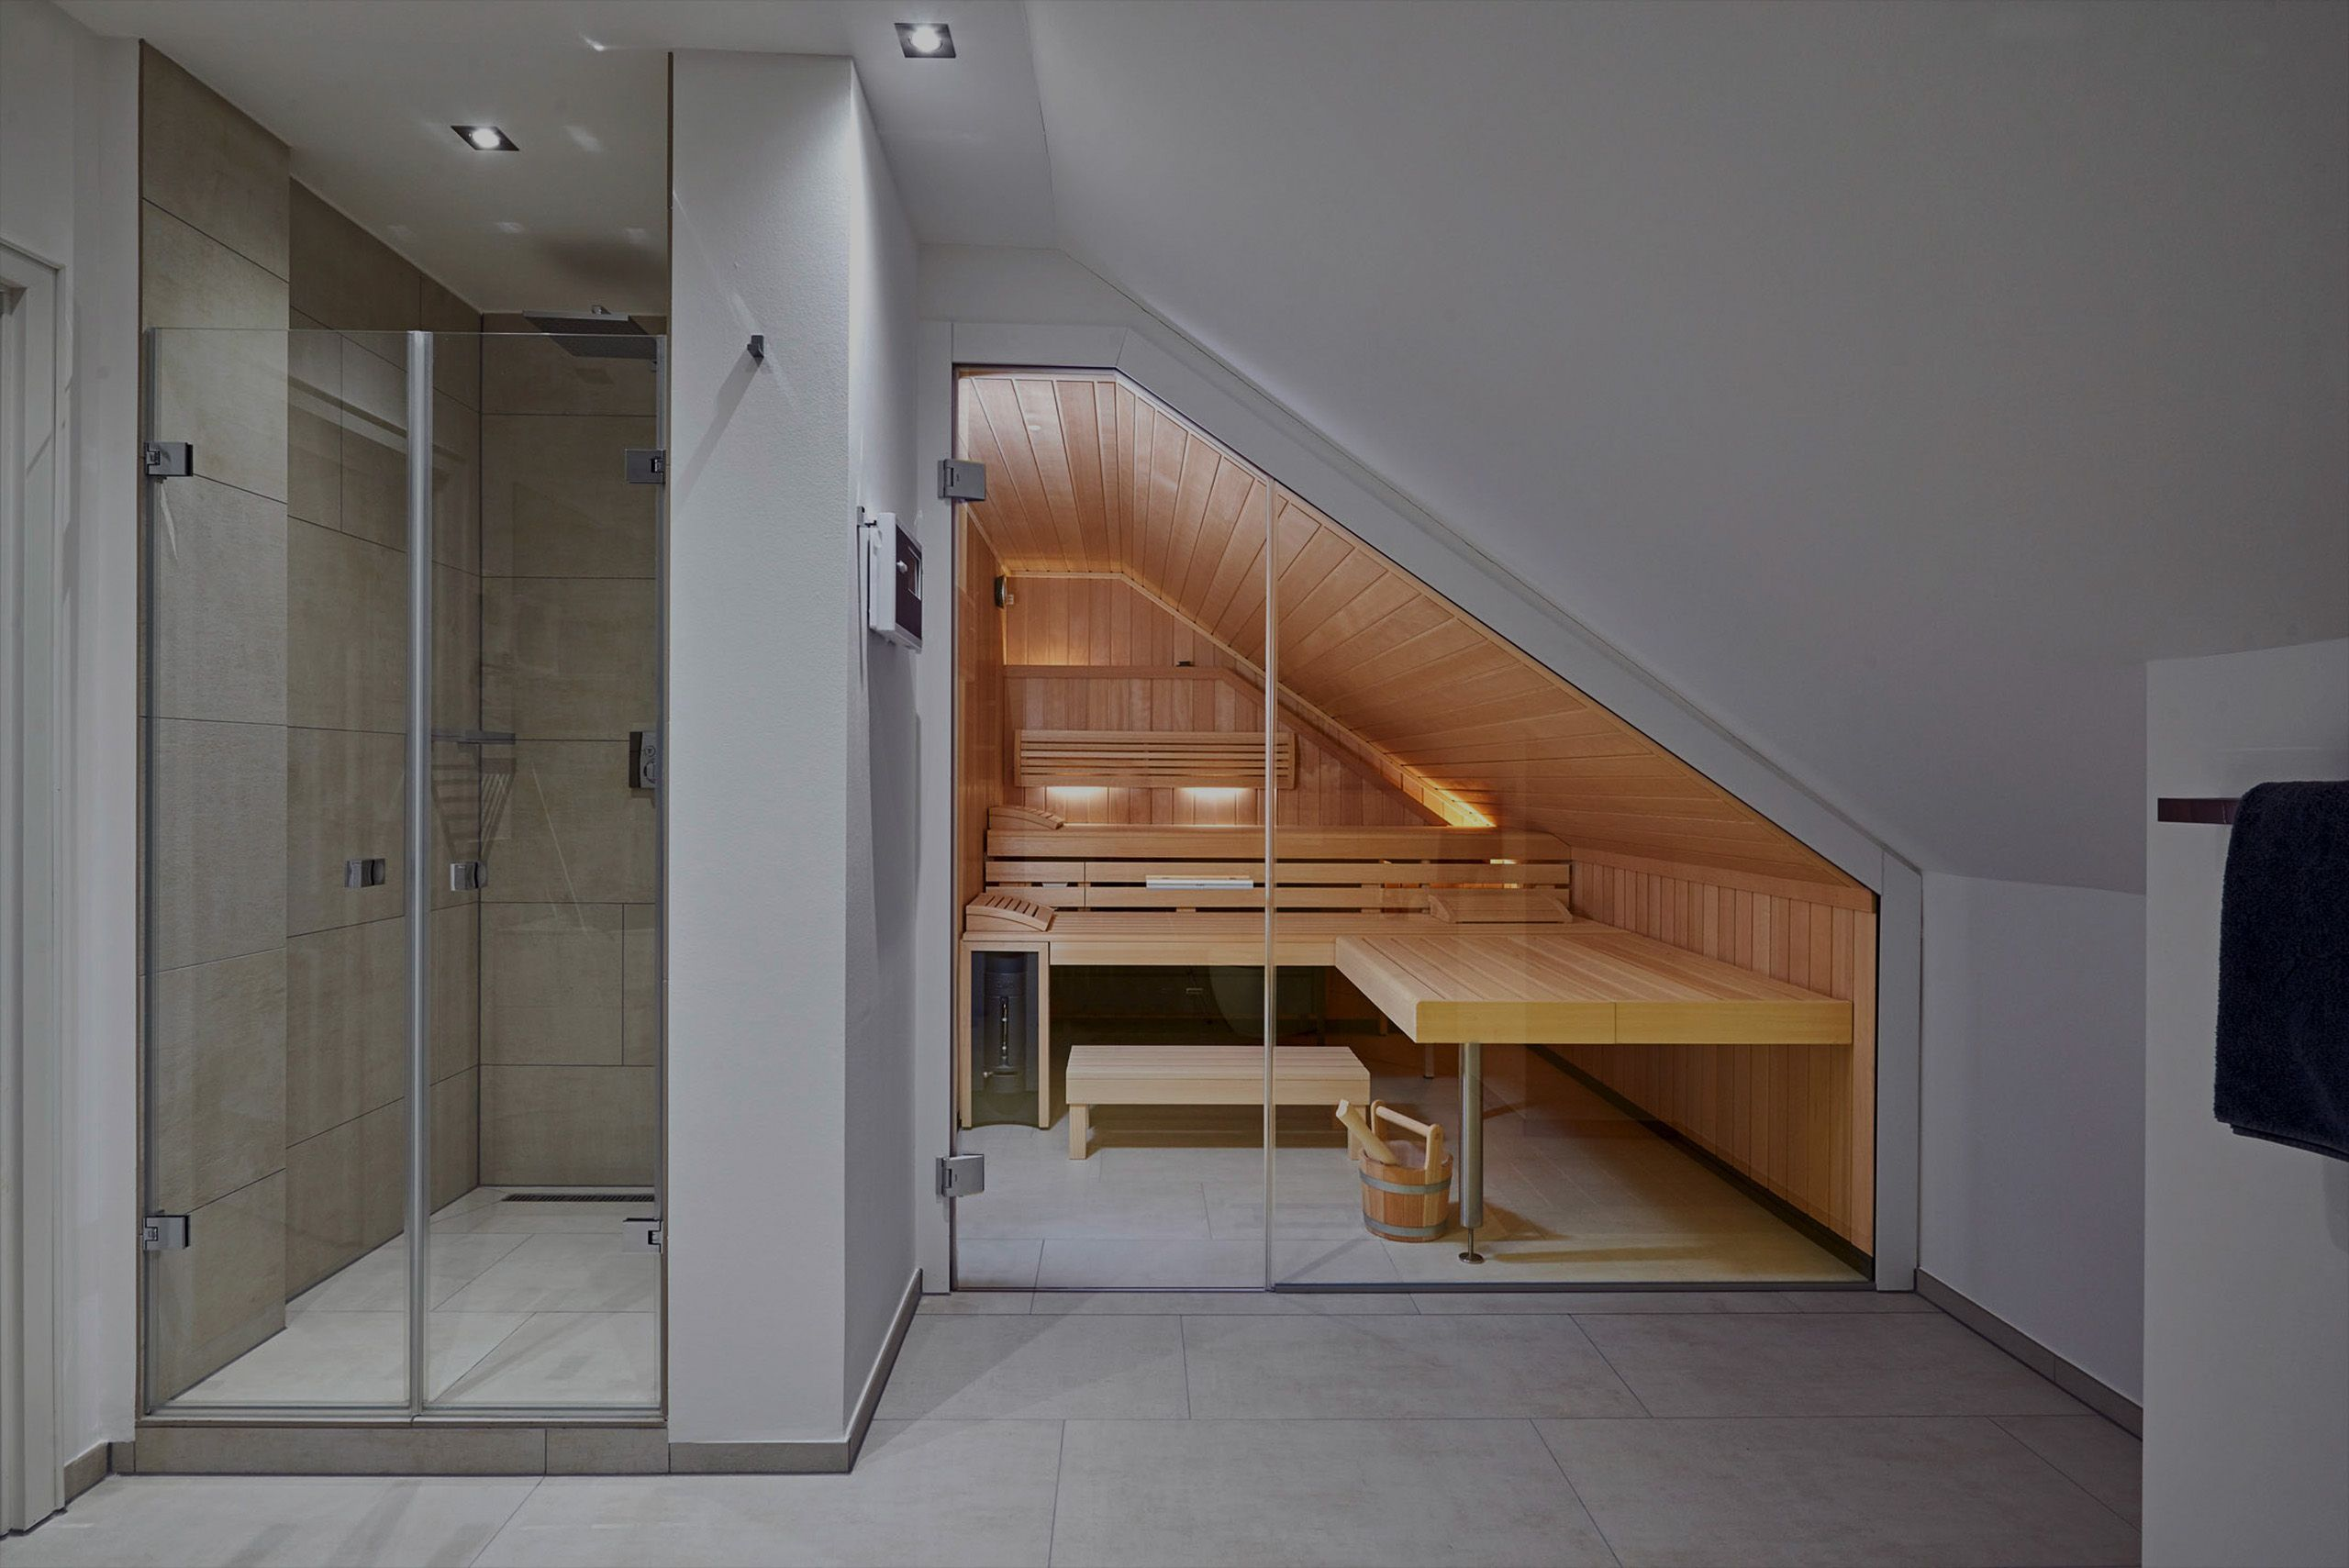 Sauna Premium Masseinbau Dachschrage Koln Badezimmer Dachschrage Badezimmer Mit Sauna Badezimmer Dachgeschoss